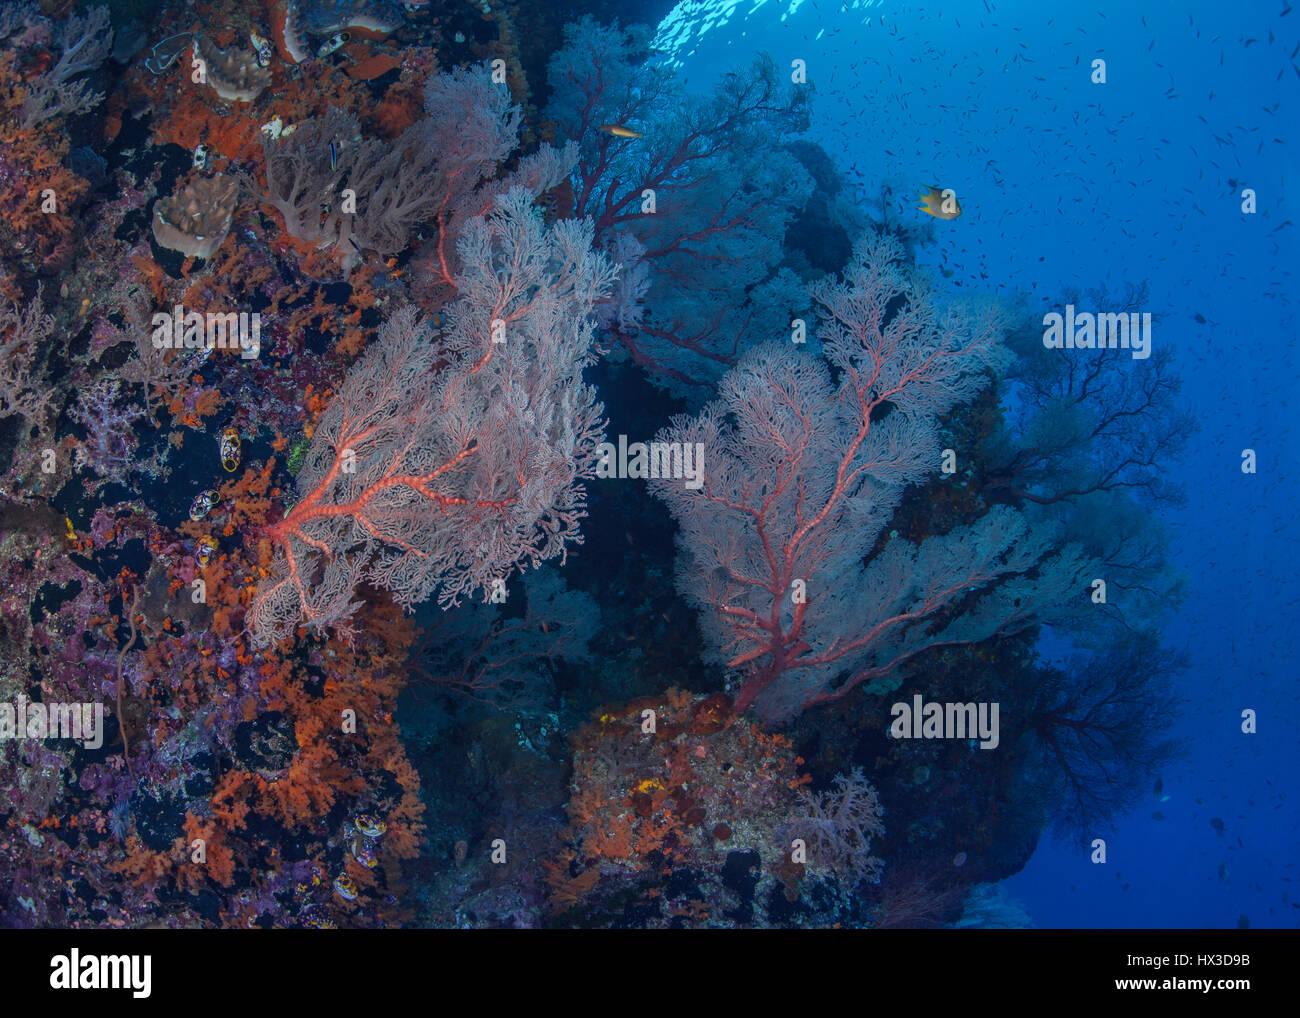 Korallenriff-Wand von leuchtenden Meer Fans bevölkert. Raja Ampat, Indonesien. Stockbild